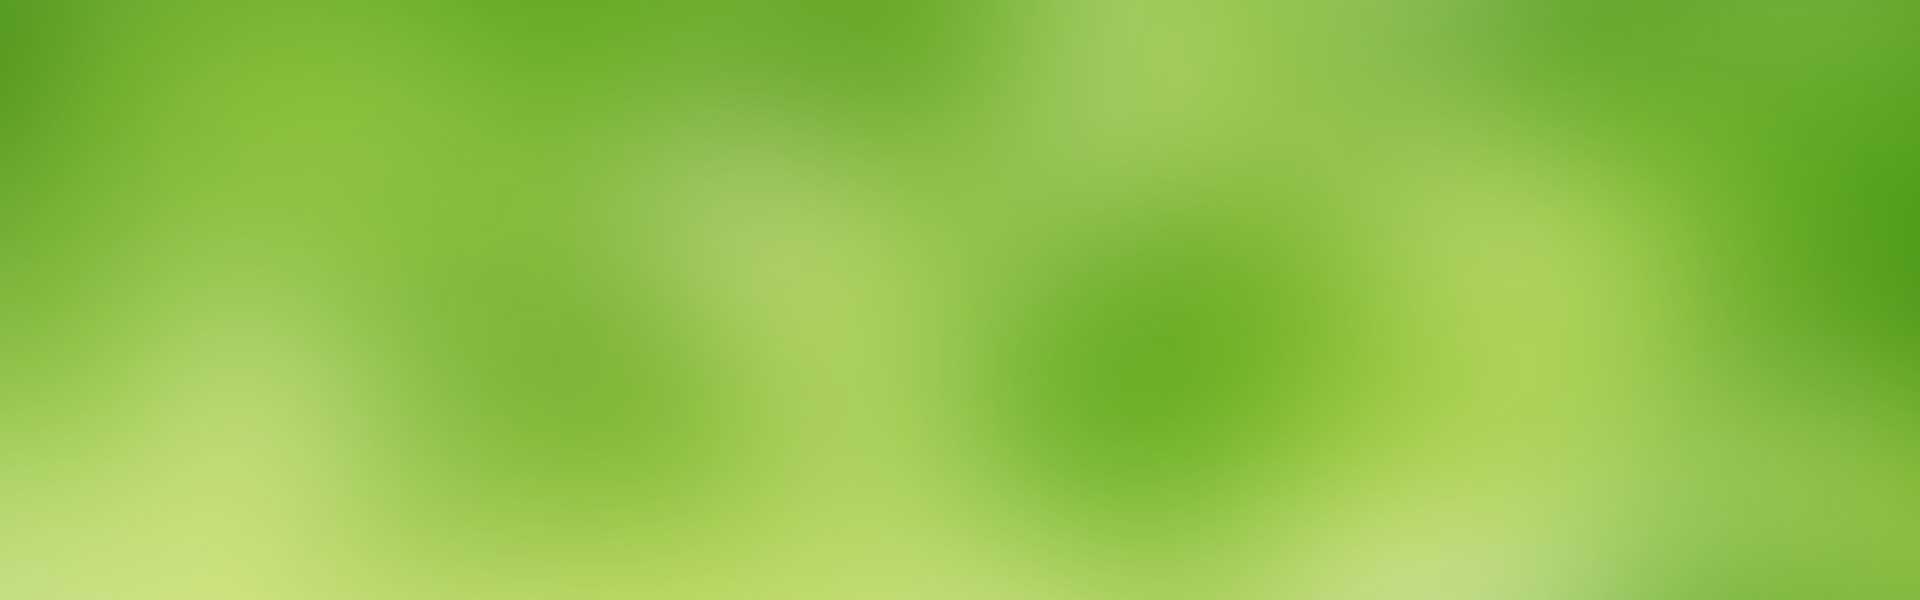 lime-banner